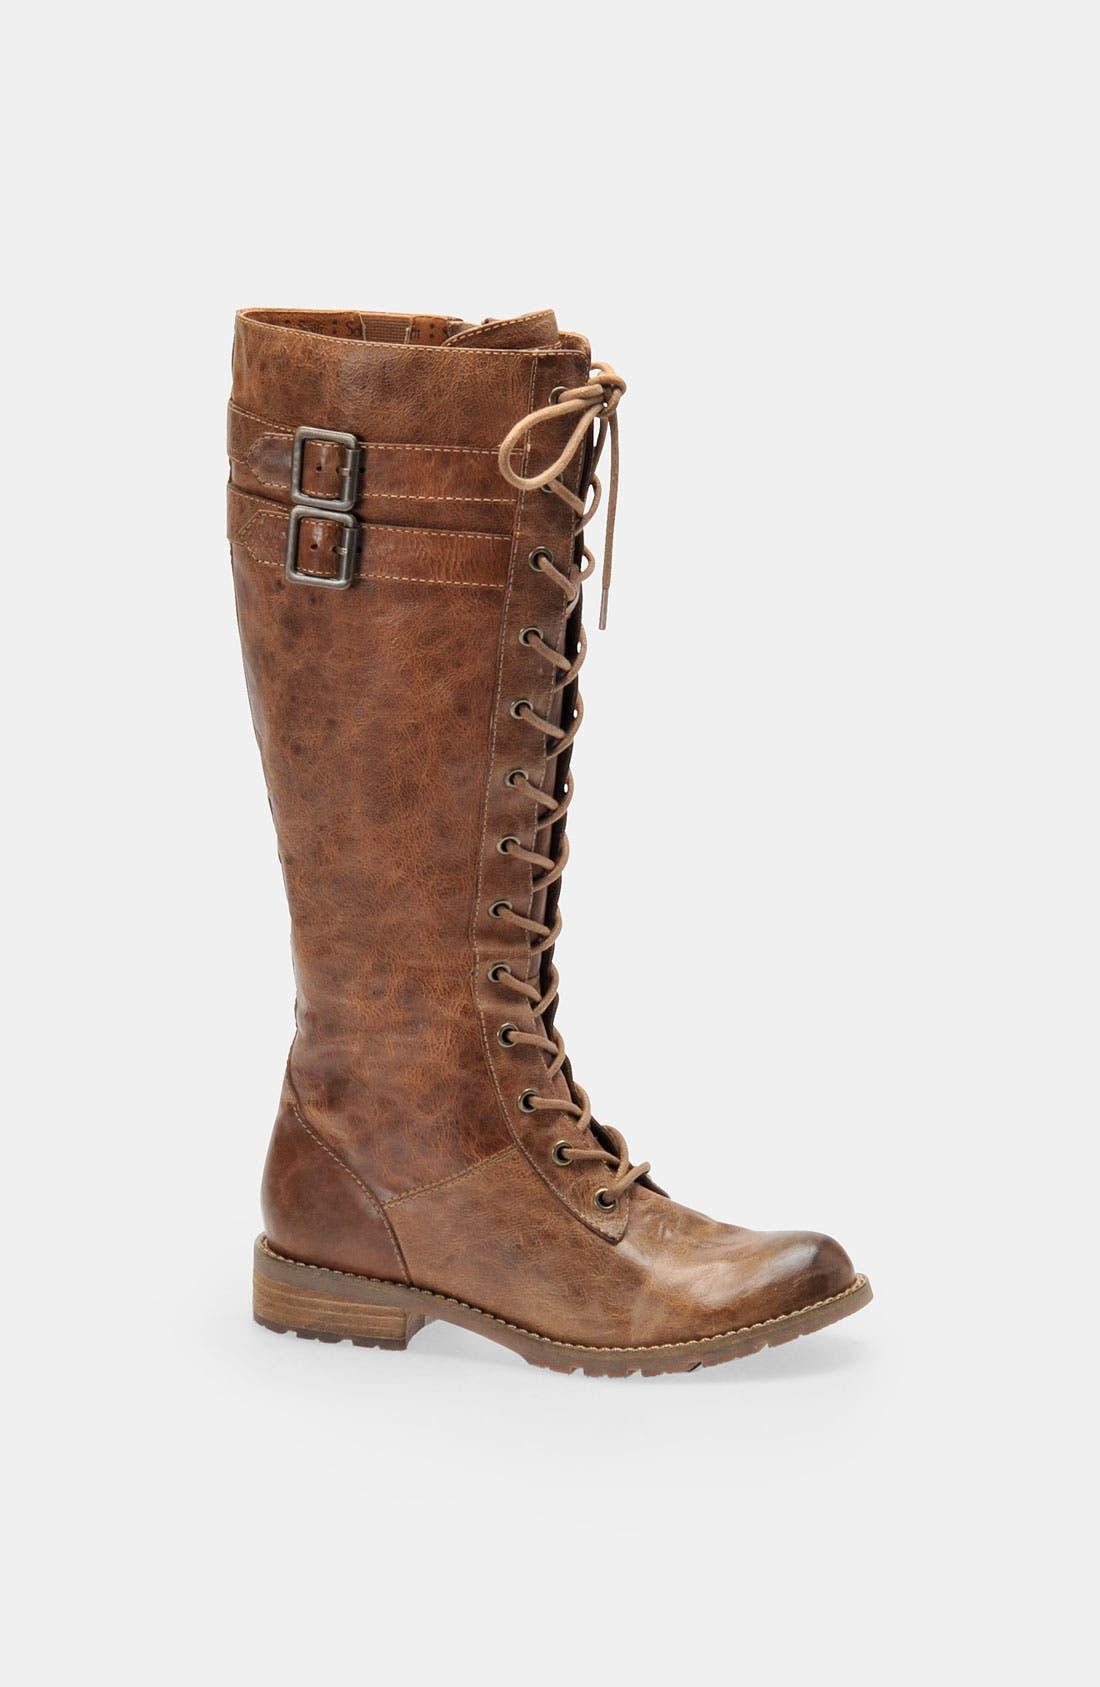 Alternate Image 1 Selected - Söfft 'Bianca' Boot